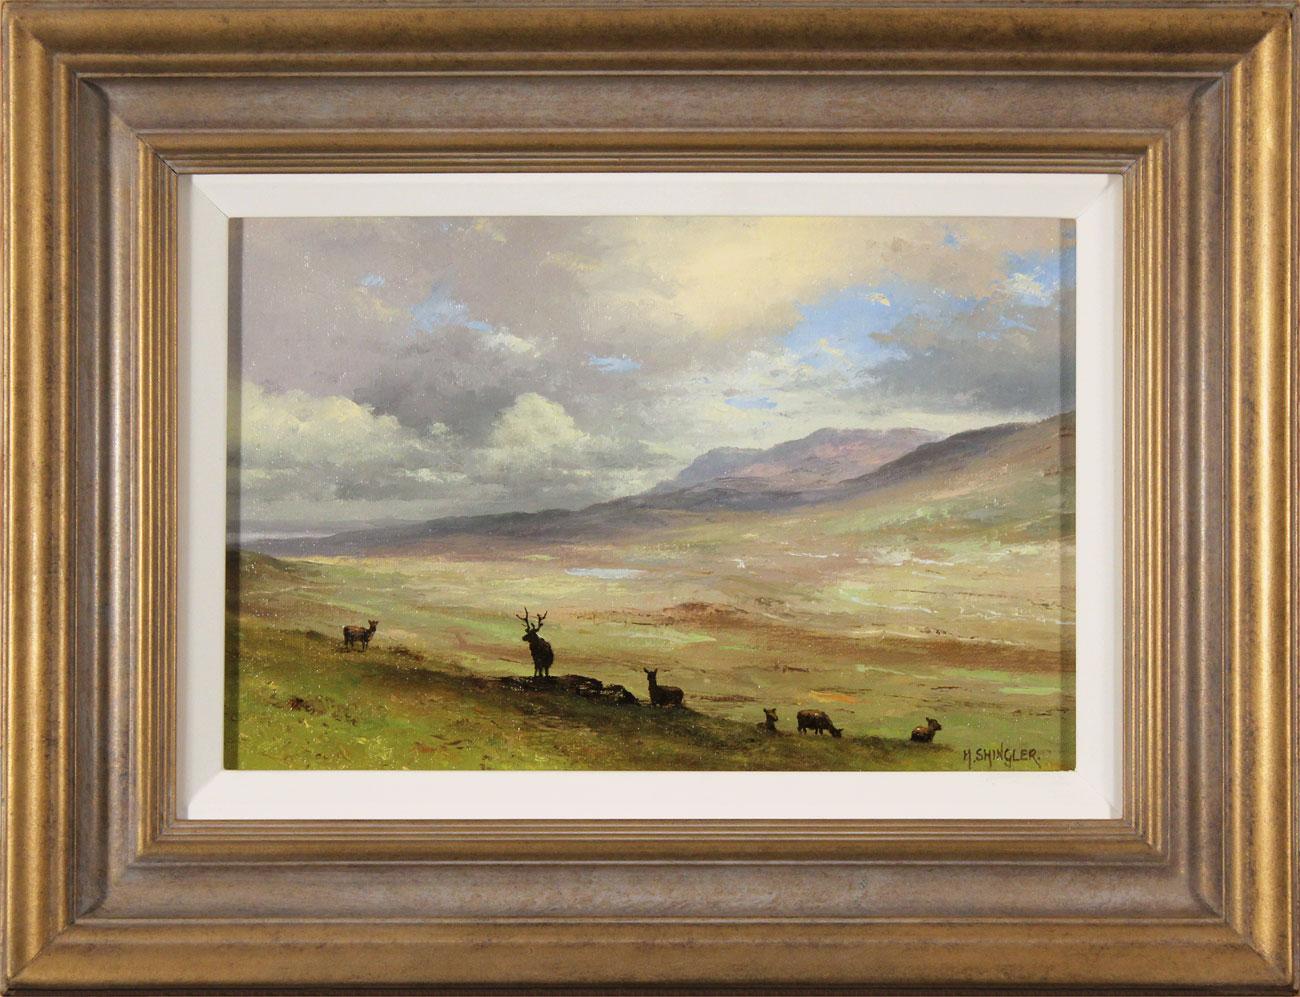 Howard Shingler, Original oil painting on panel, North Highlands Click to enlarge